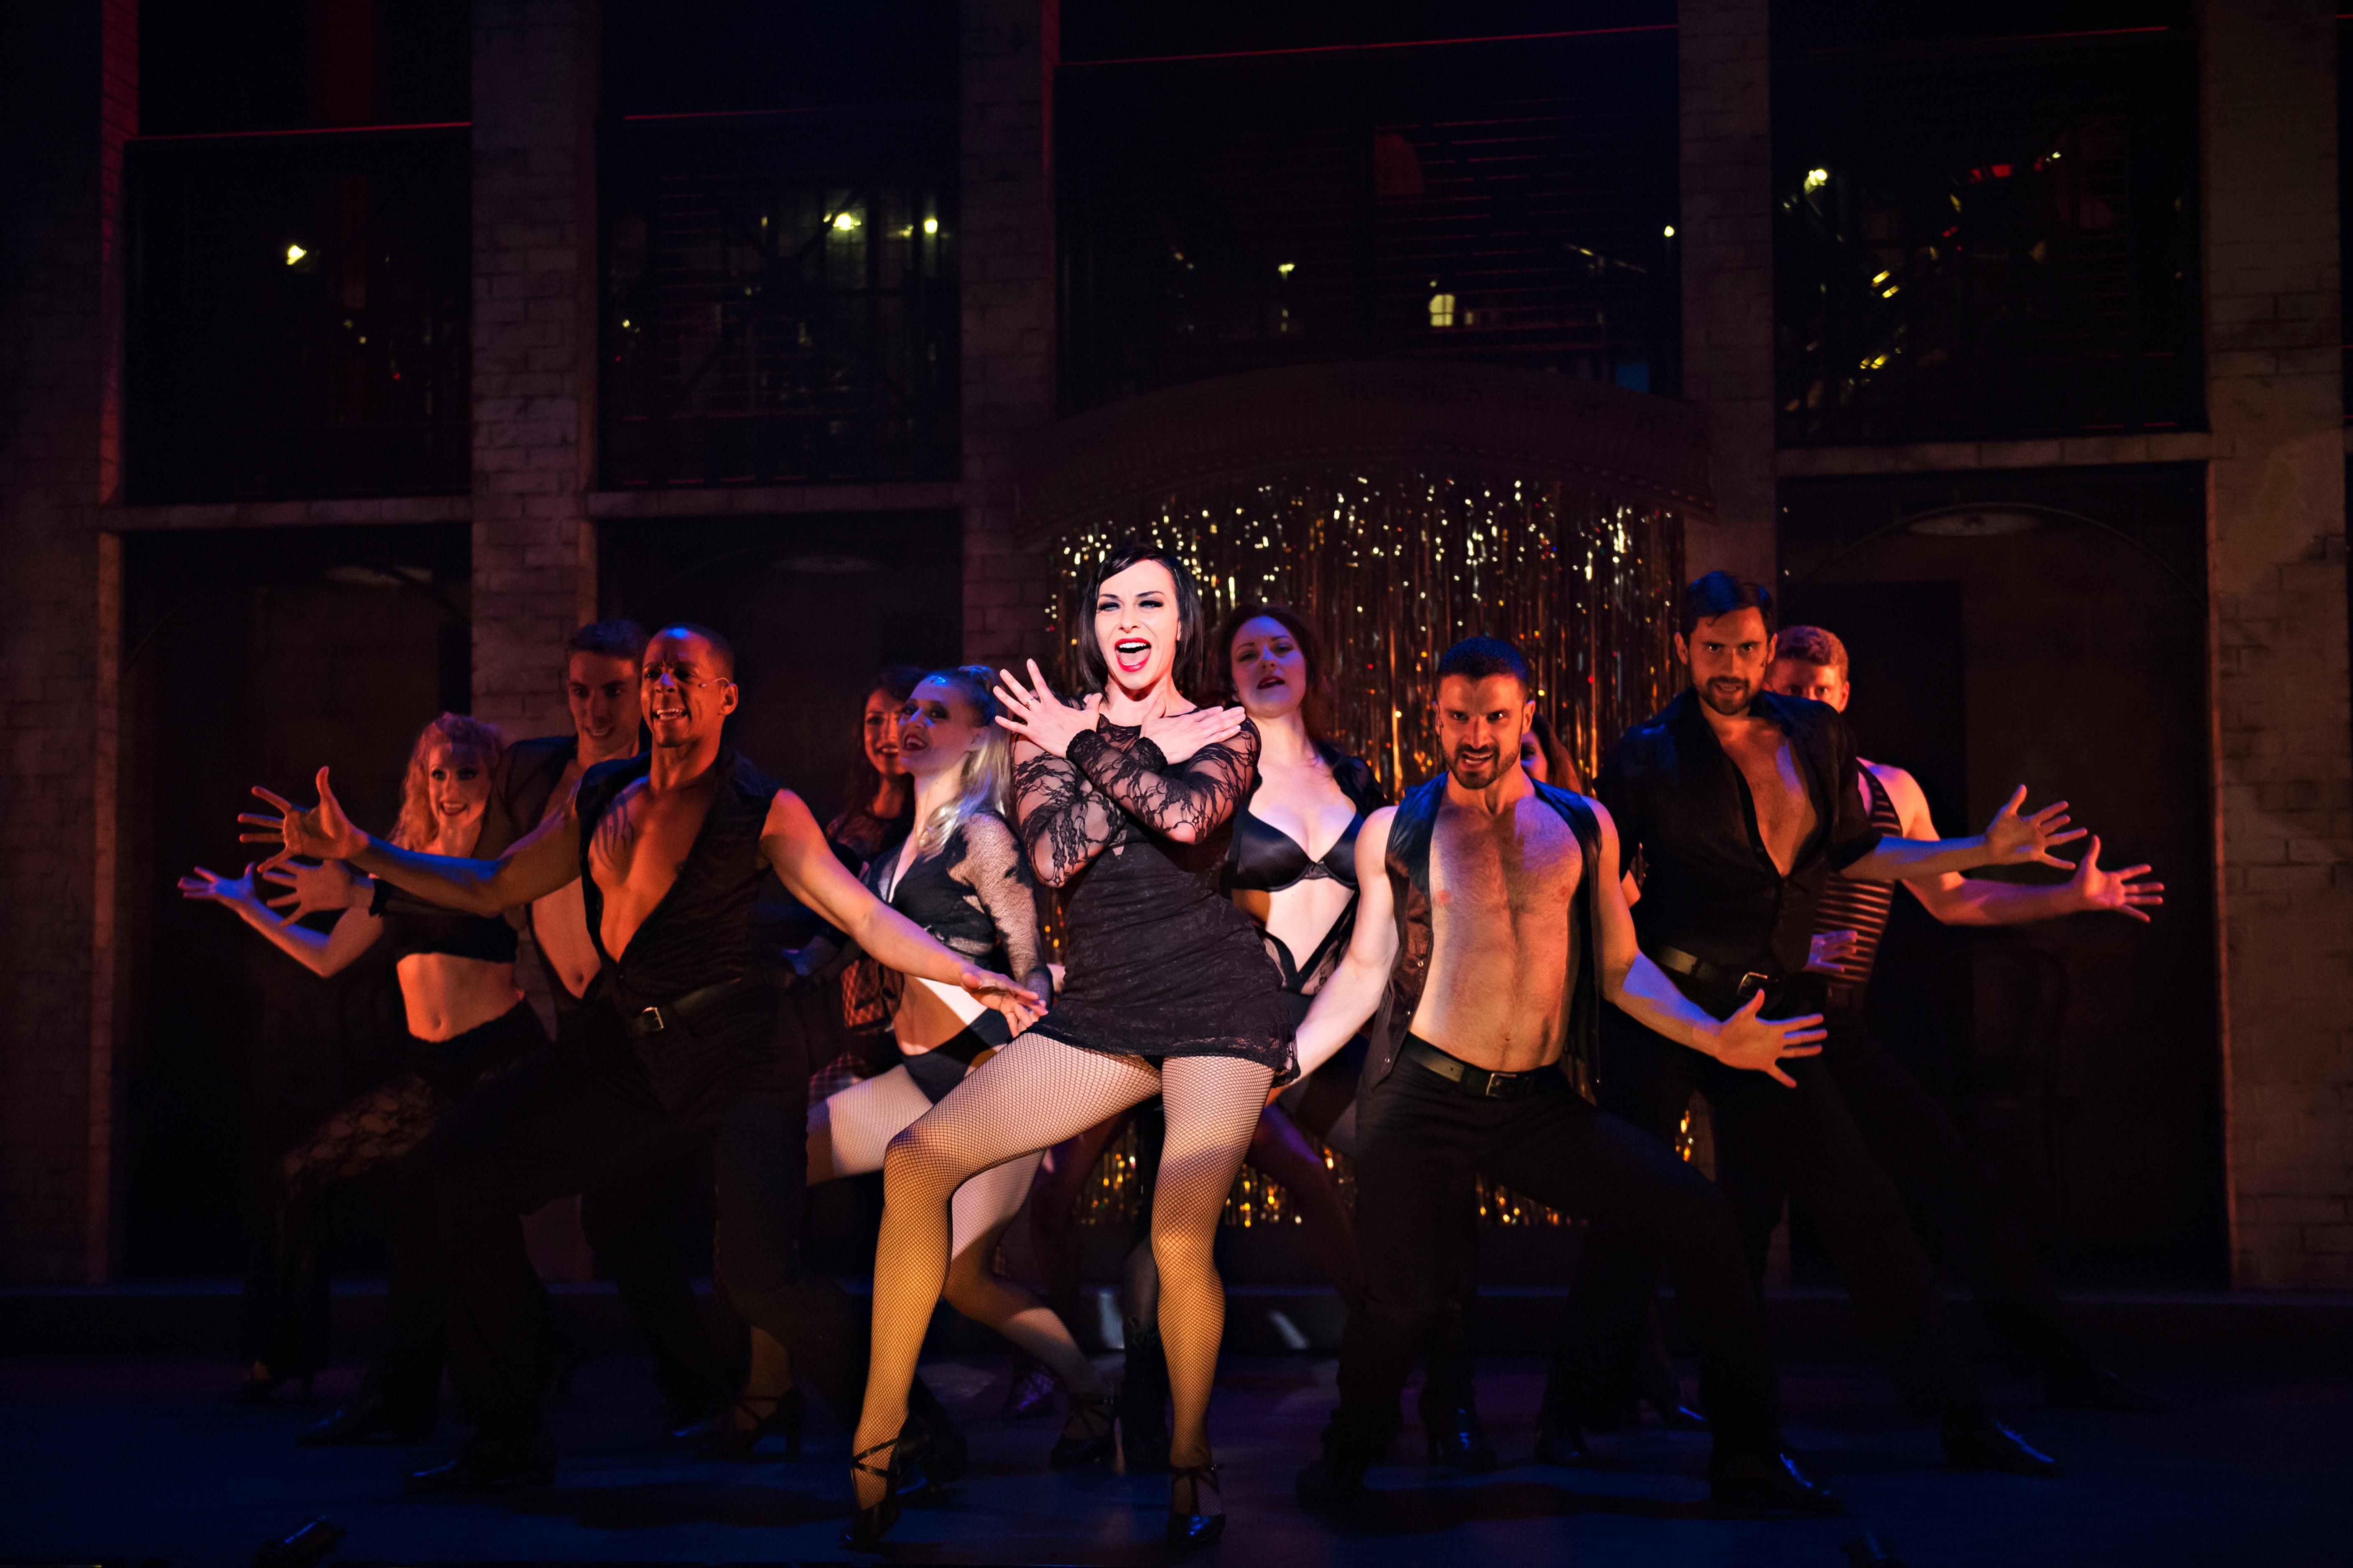 Jodi McFadden and the Cast of Chicago_Drayton Entertainment_2015